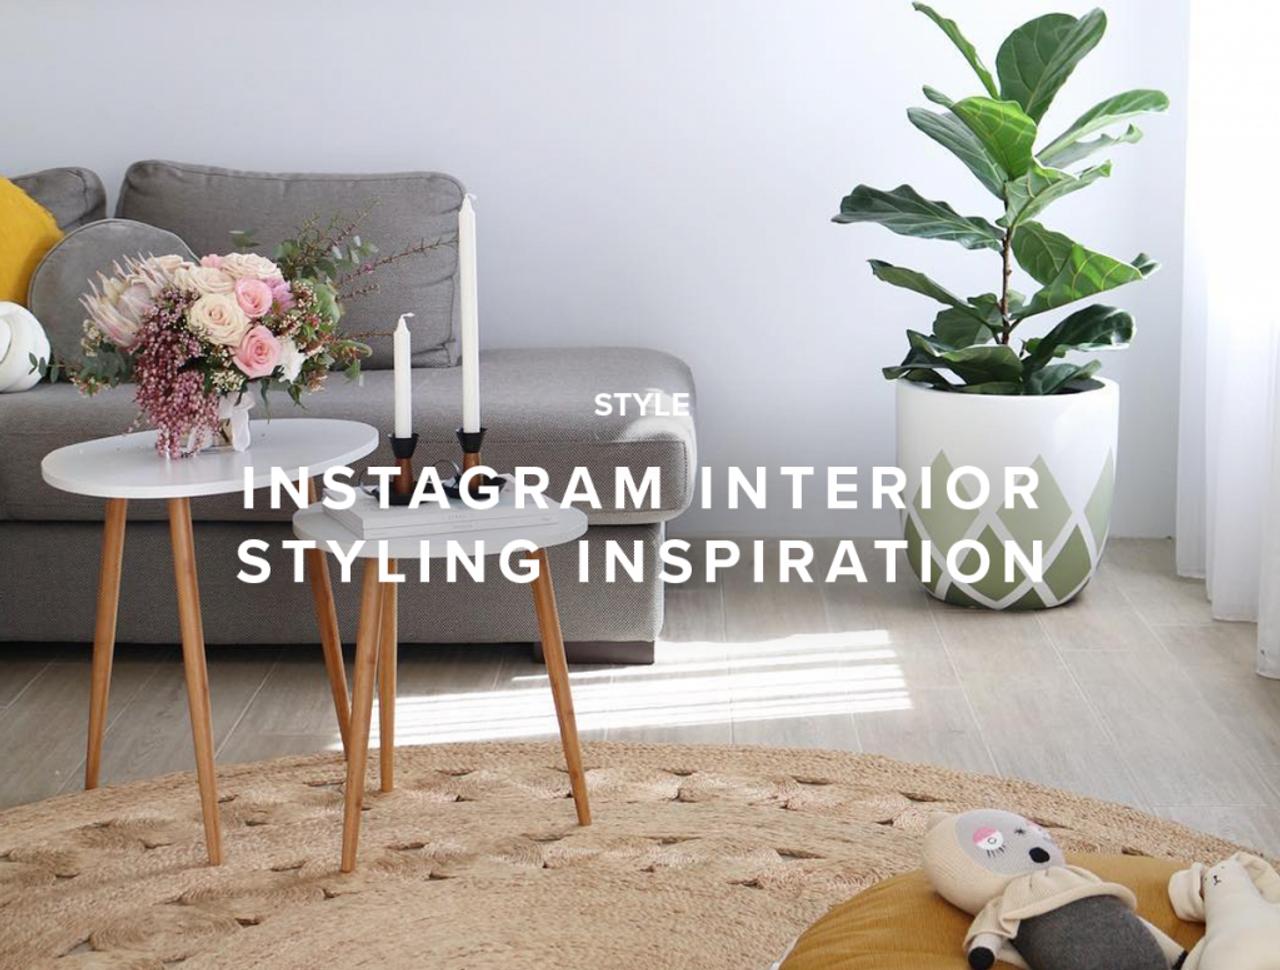 Mocka's Instagram Picks for Styling Inspiration